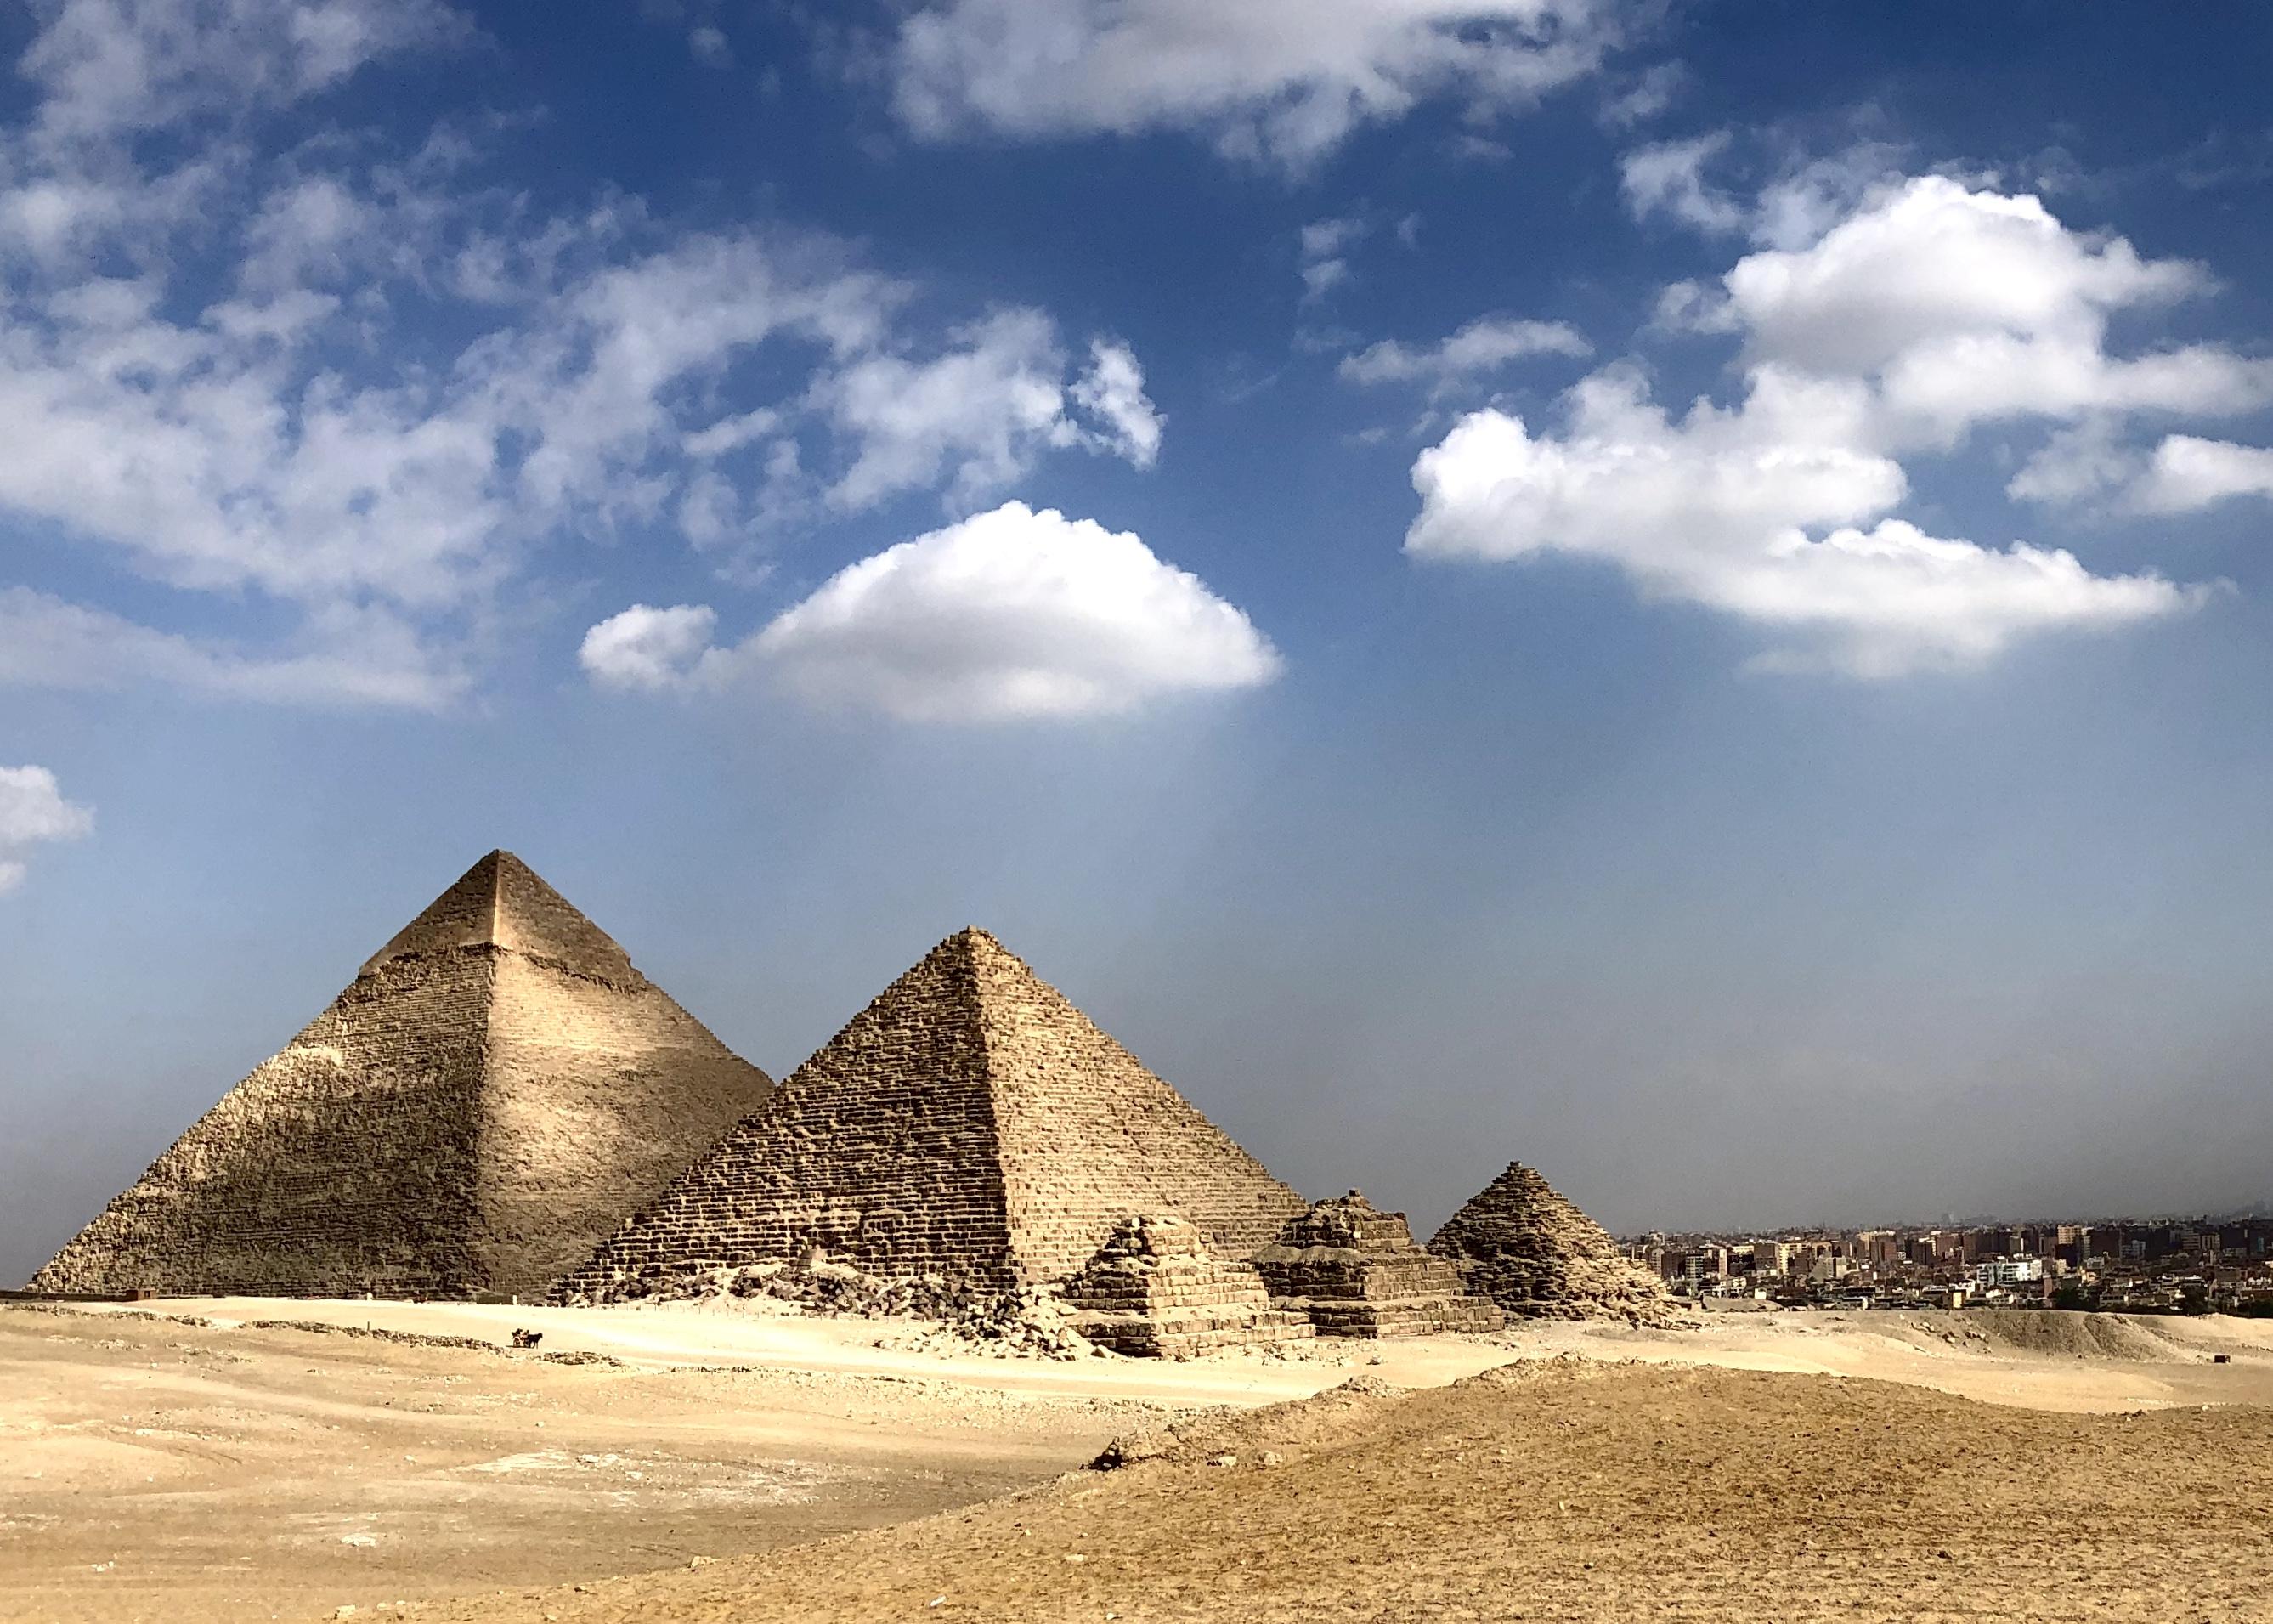 Free Images : pyramids, giza, egypt, desert, pyramid, monument